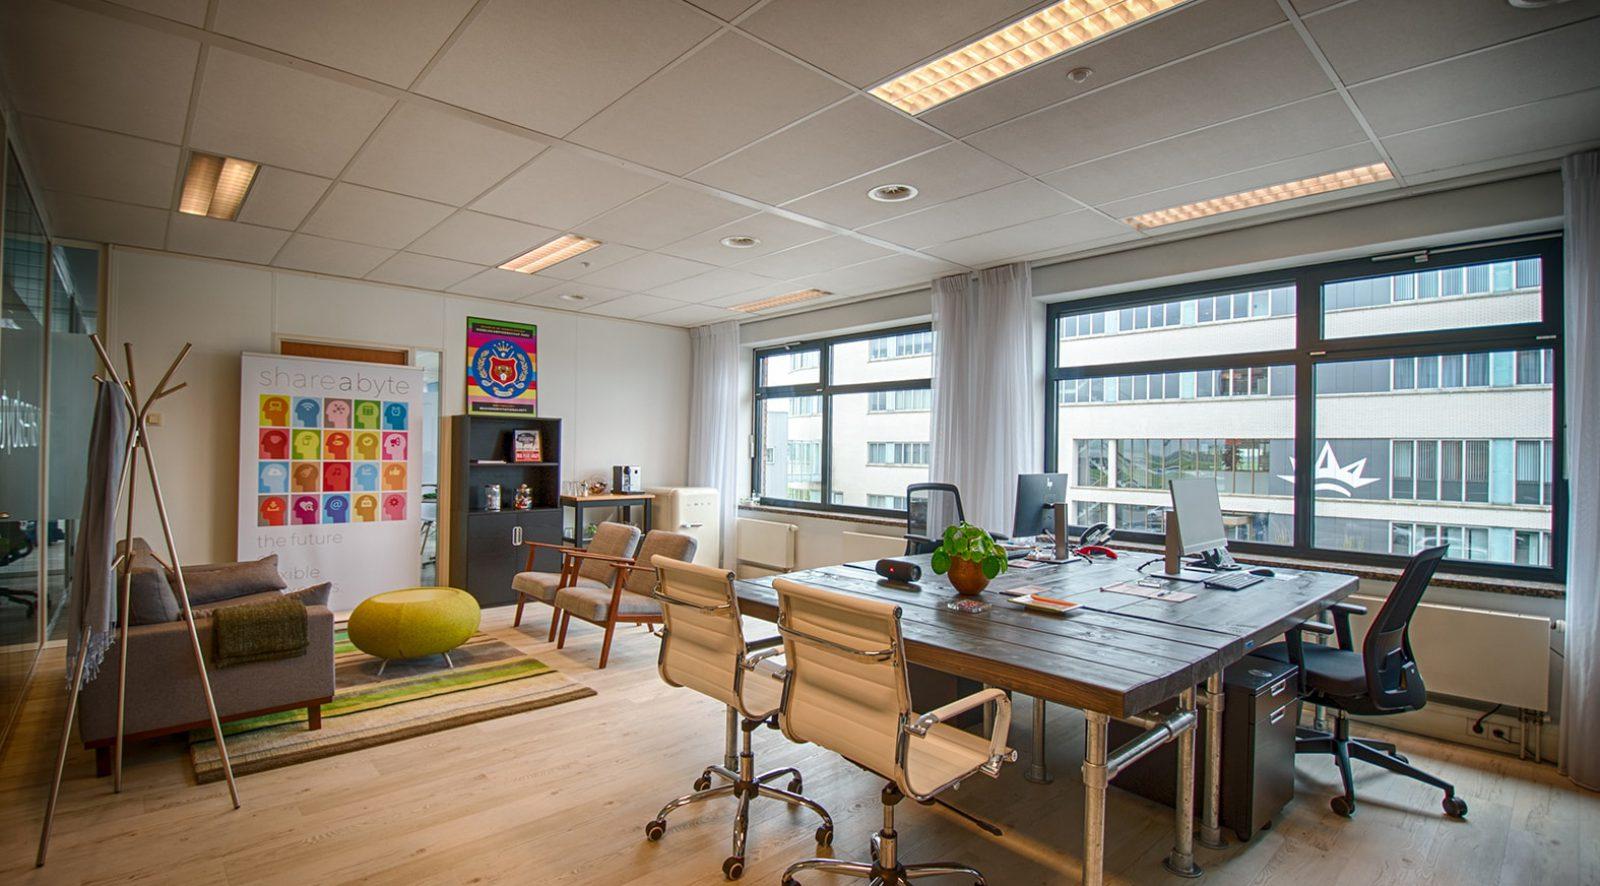 Bedrijfsruimte te huur in Bodegraven | Crown Business Center Bodegraven